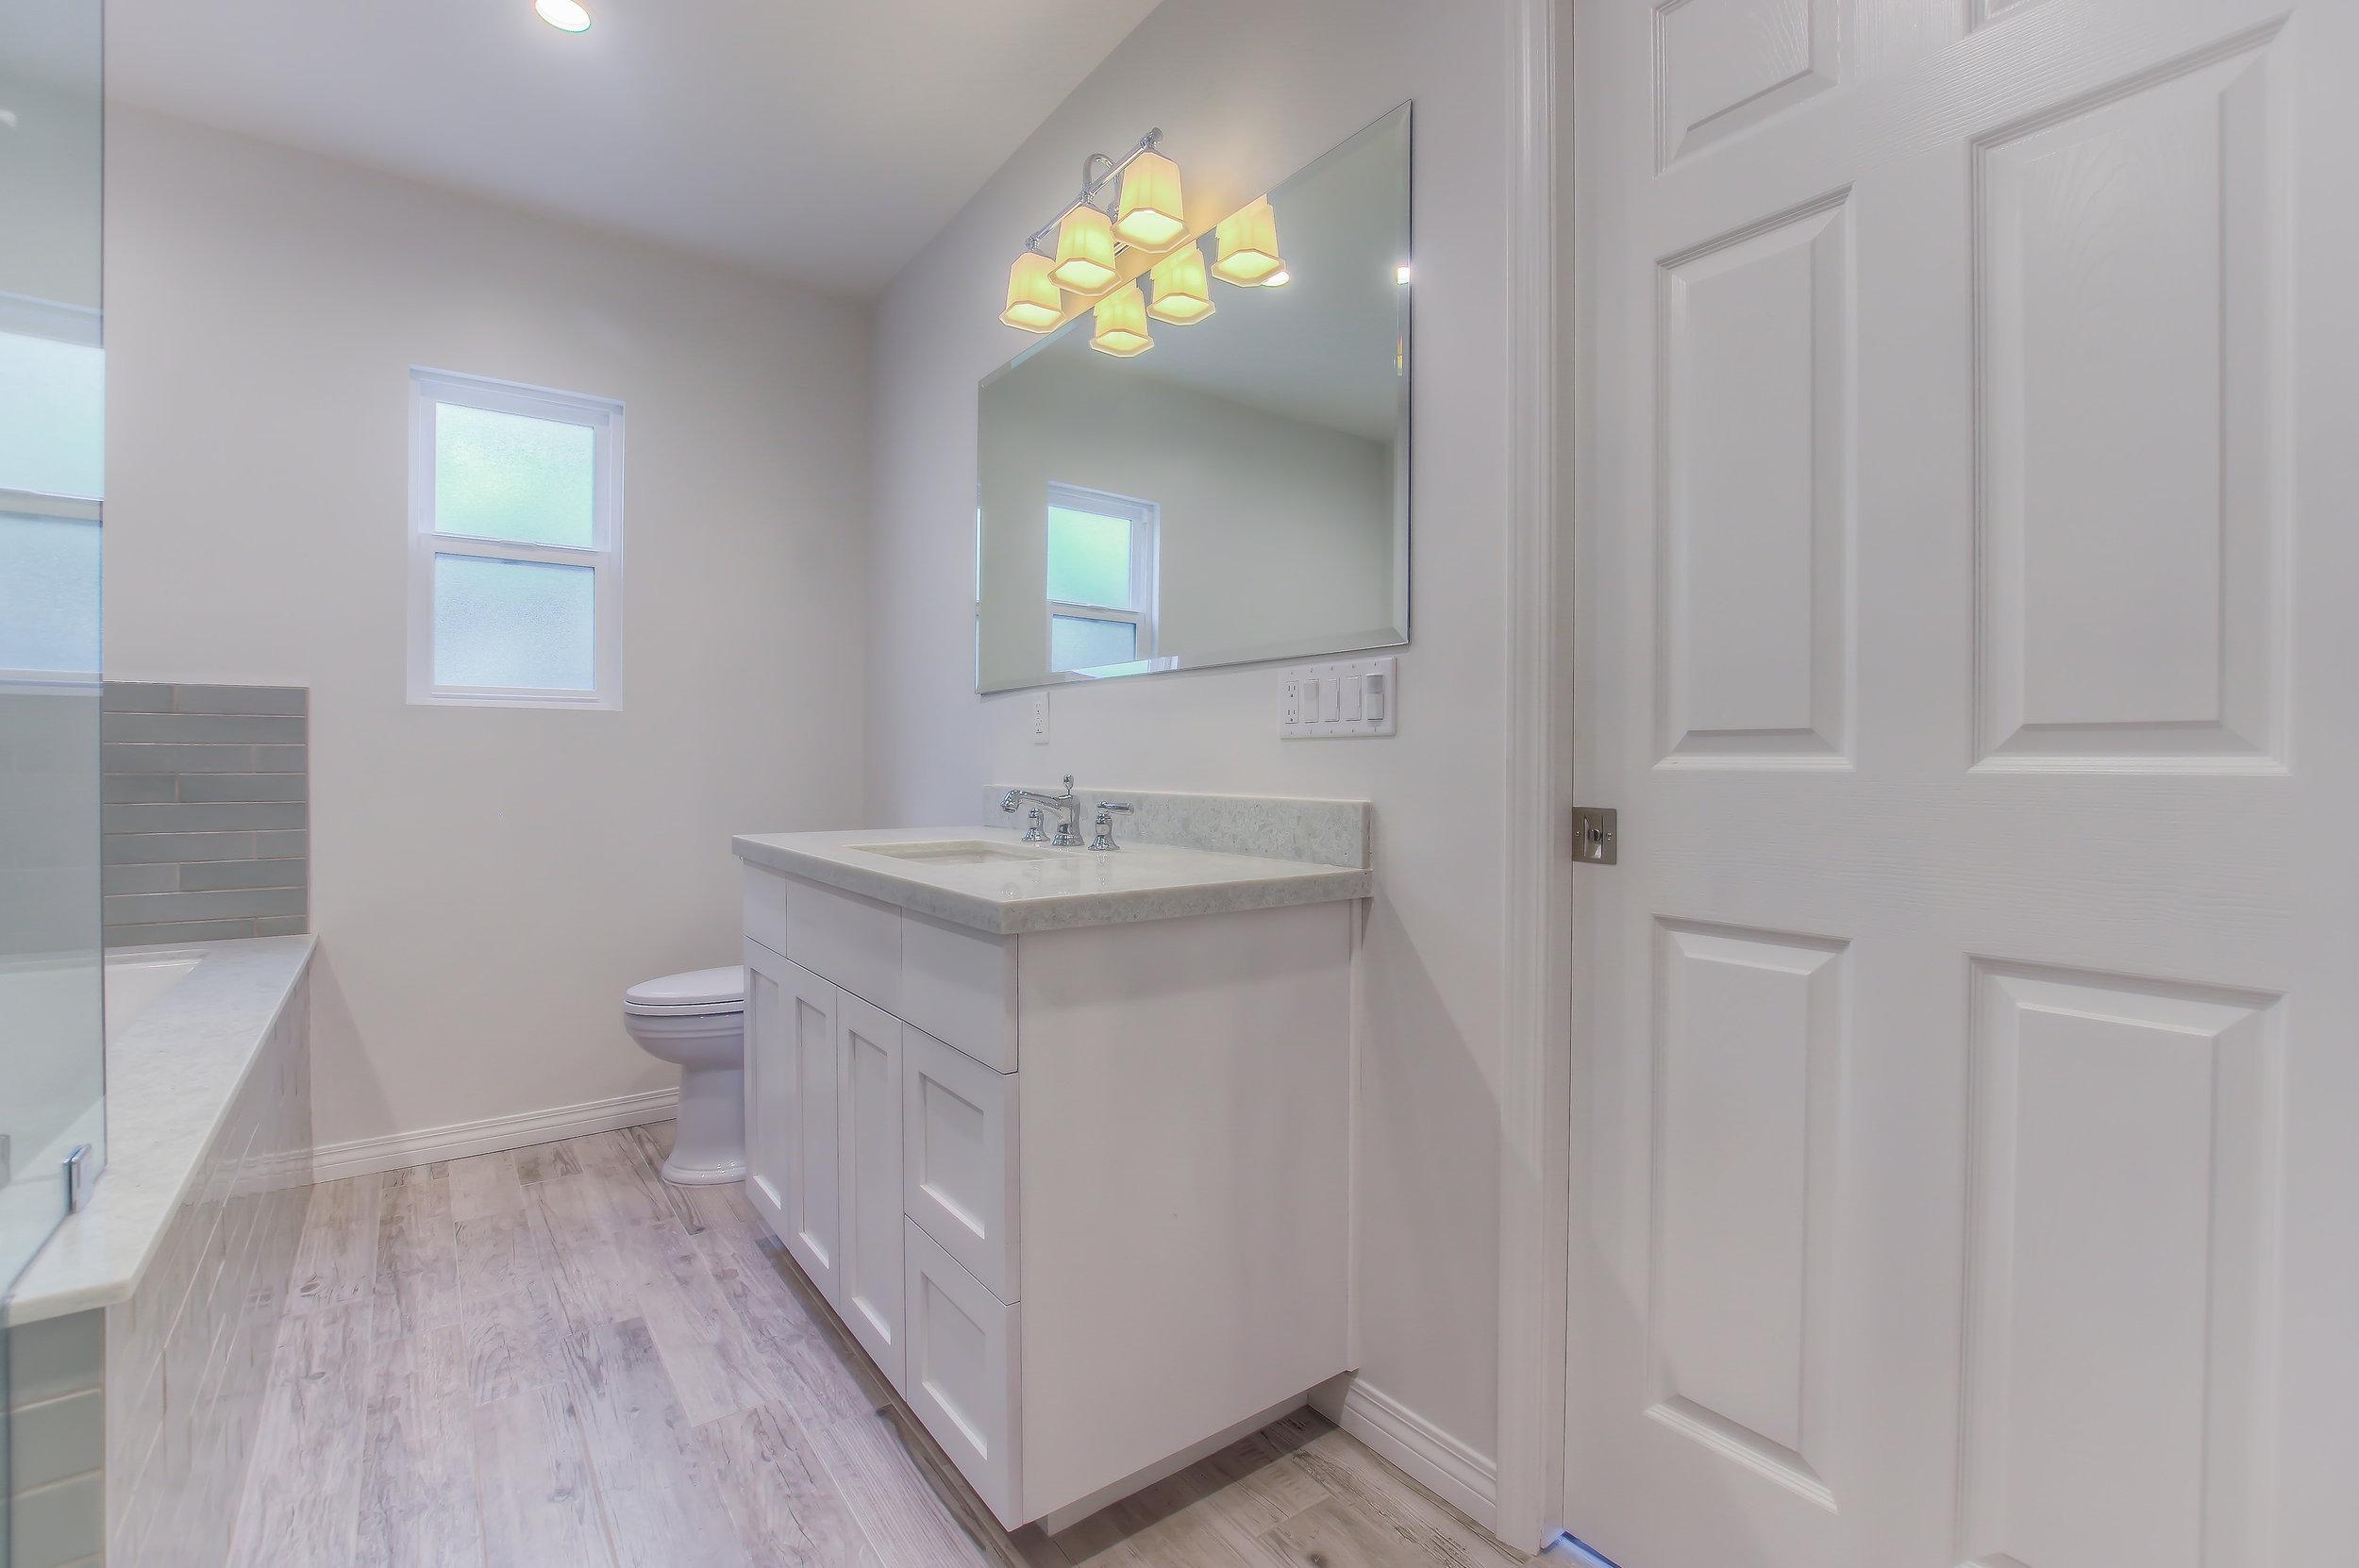 Burbank complete bathroom remodel